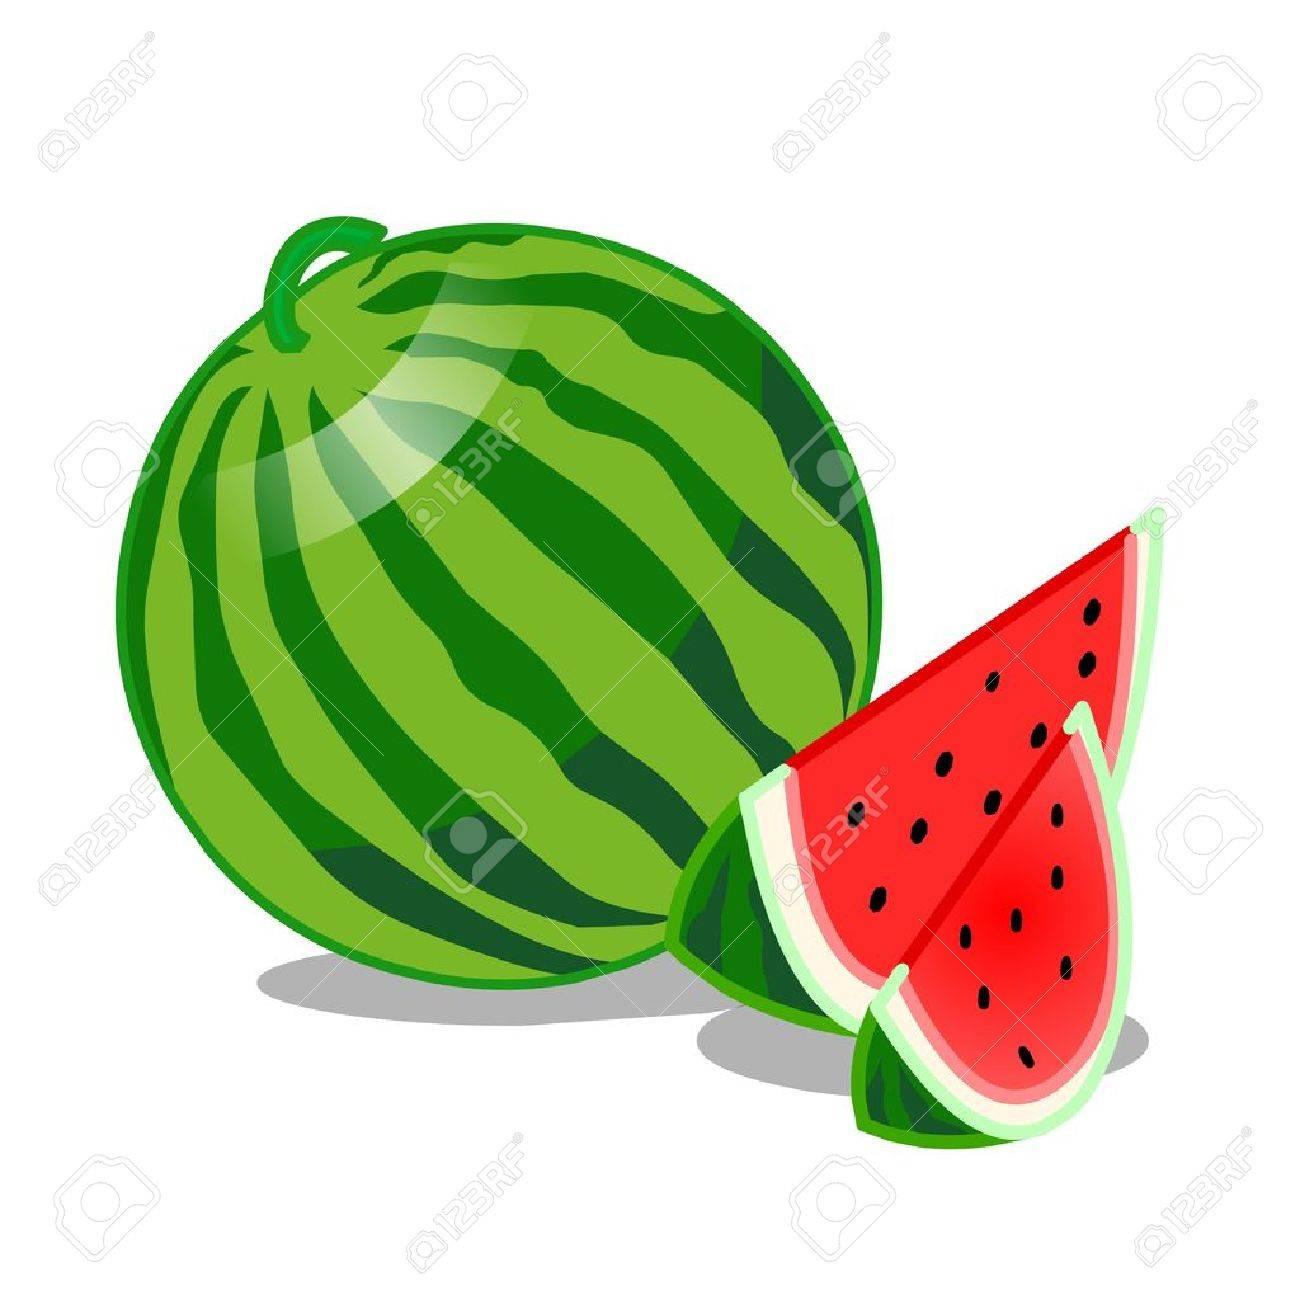 Watermelon Fruit isolated illustration on white background Stock Vector - 22156467